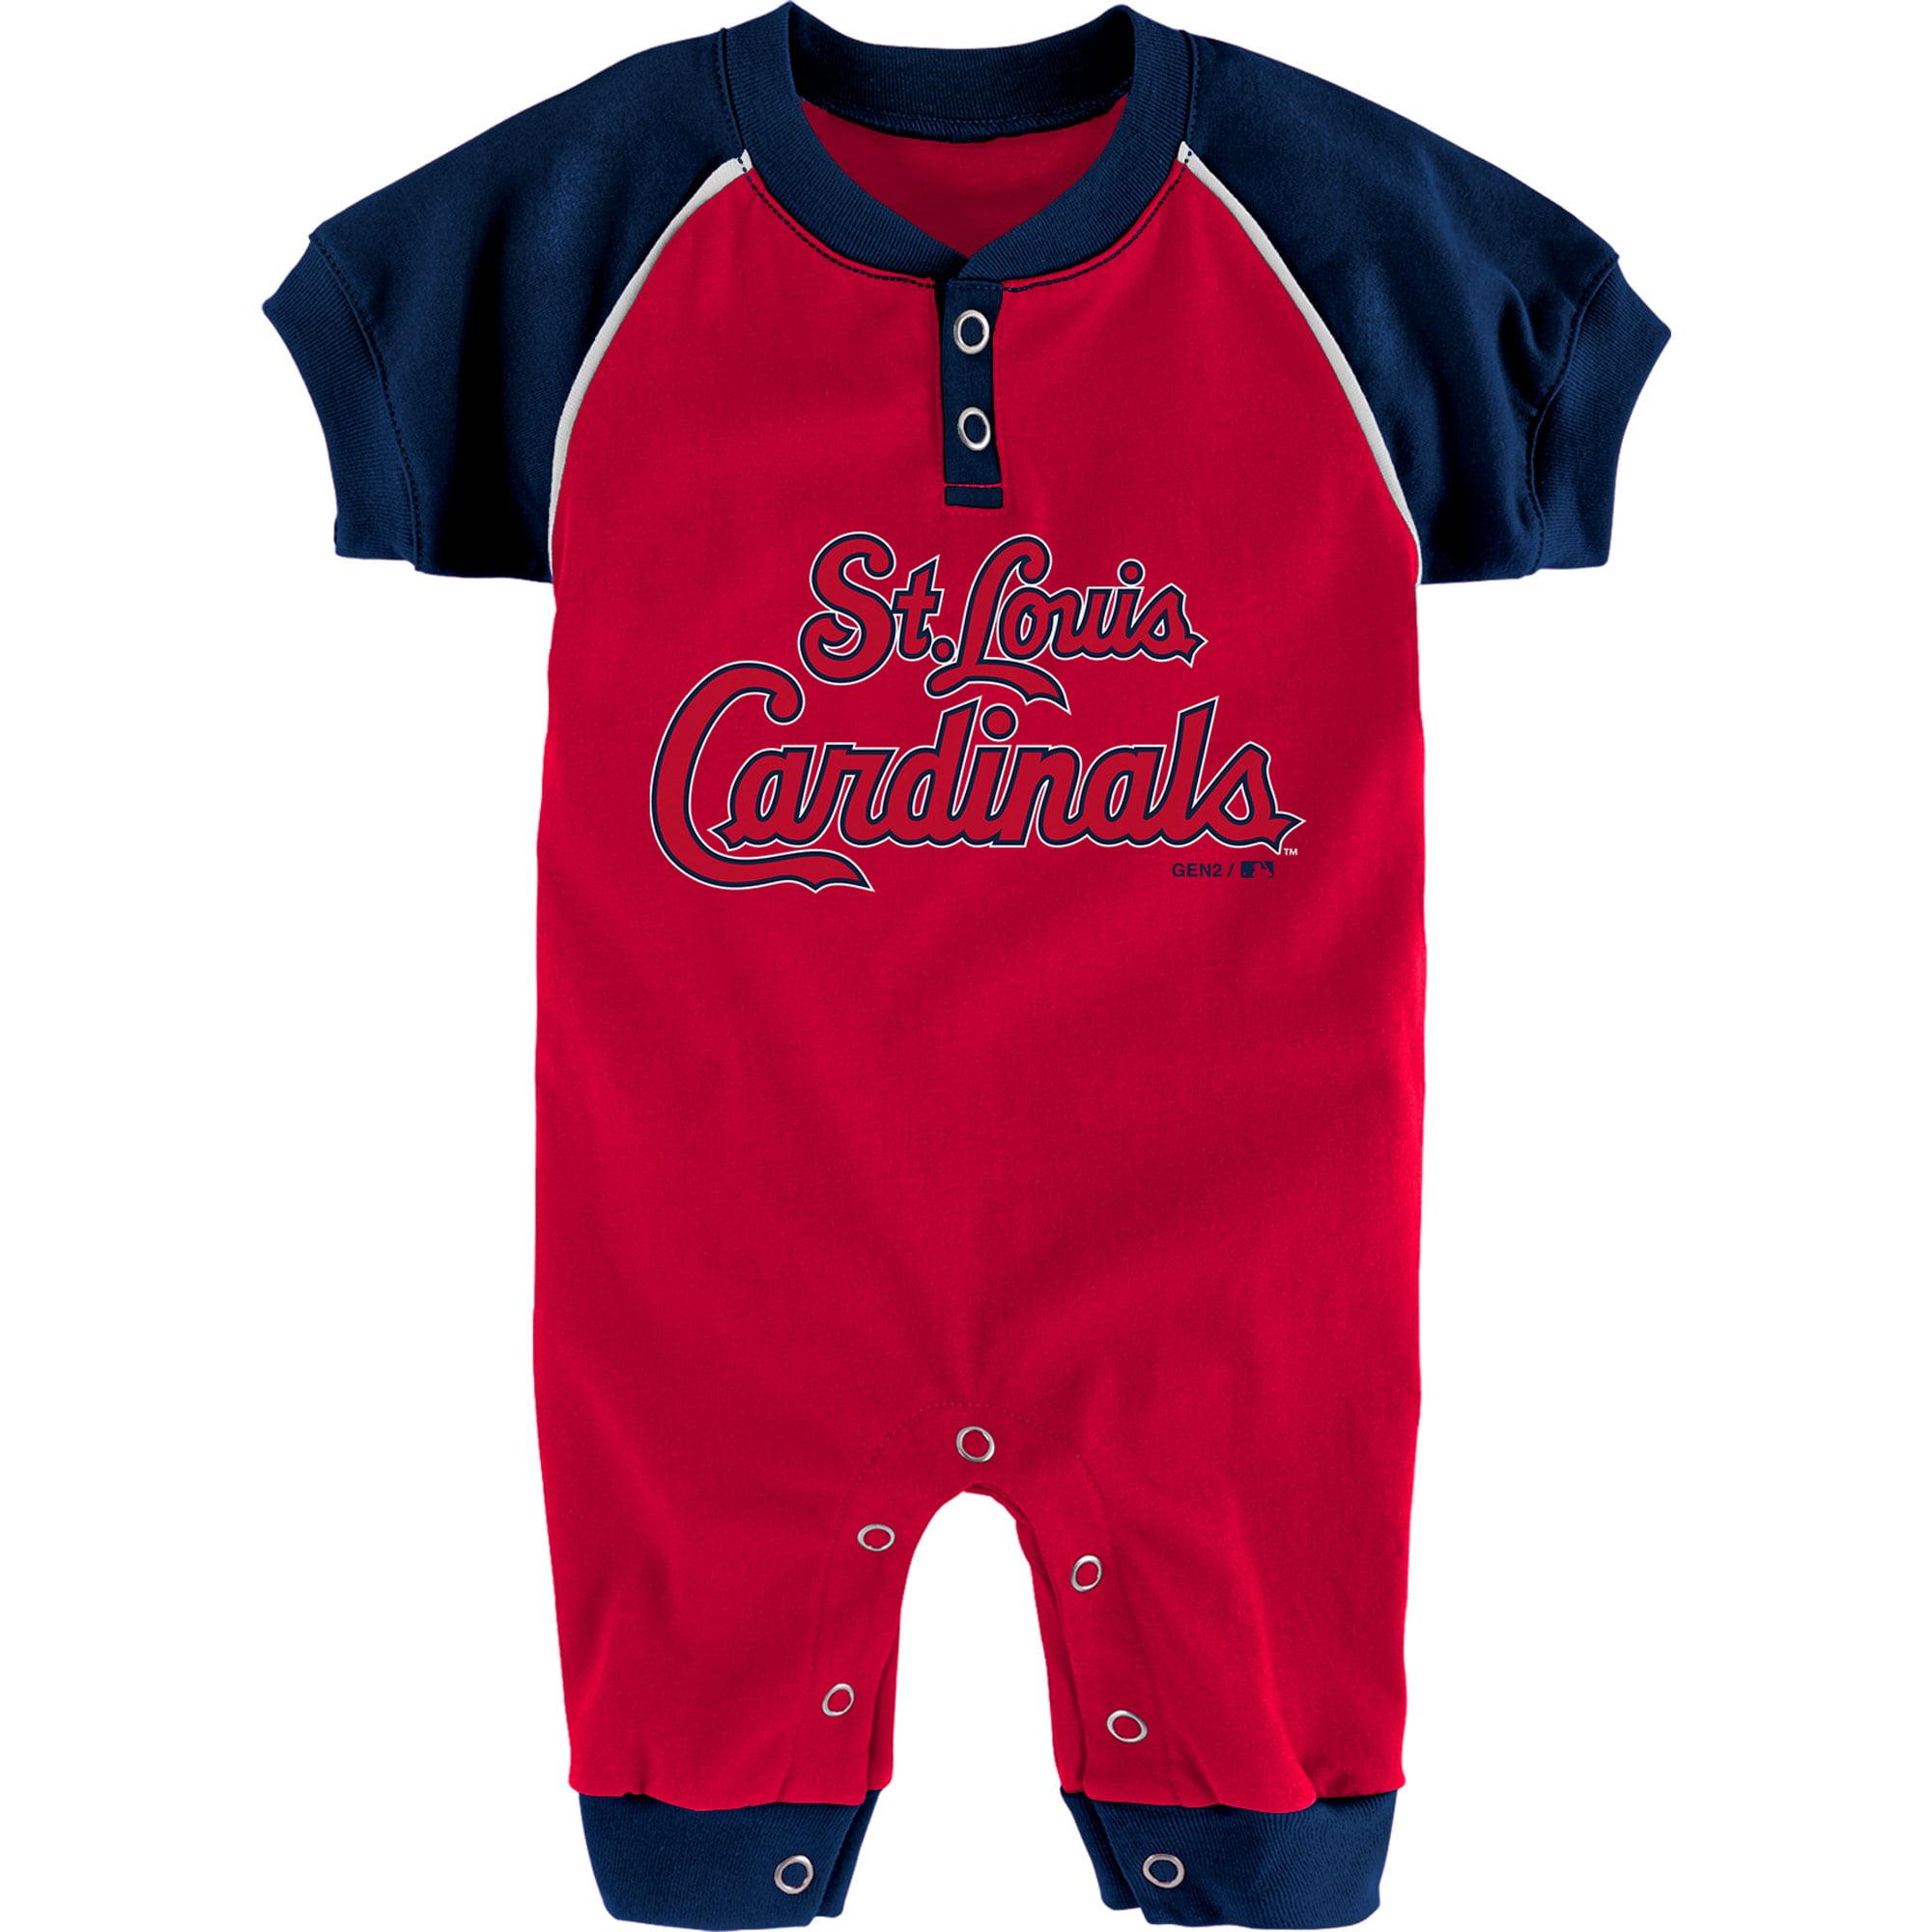 St. Louis Cardinals Newborn & Infant Game Time Jumper - Red/Navy